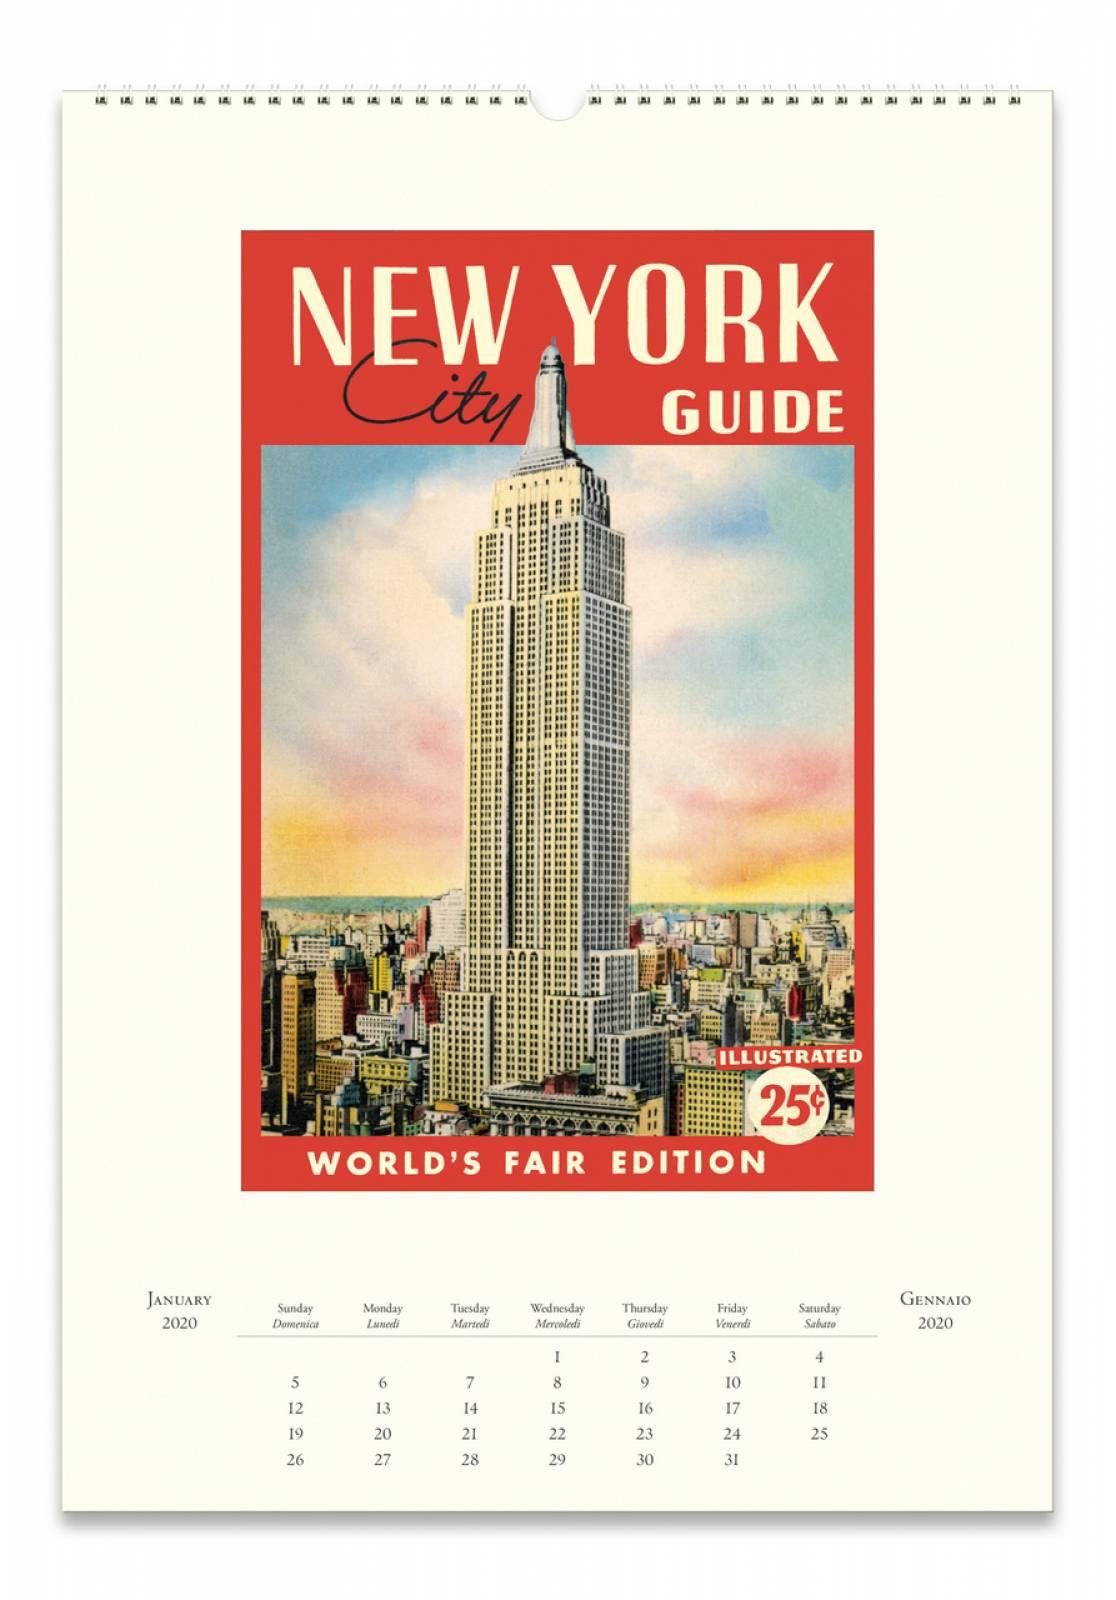 New York Wall Calendar by Cavallini thumbnails